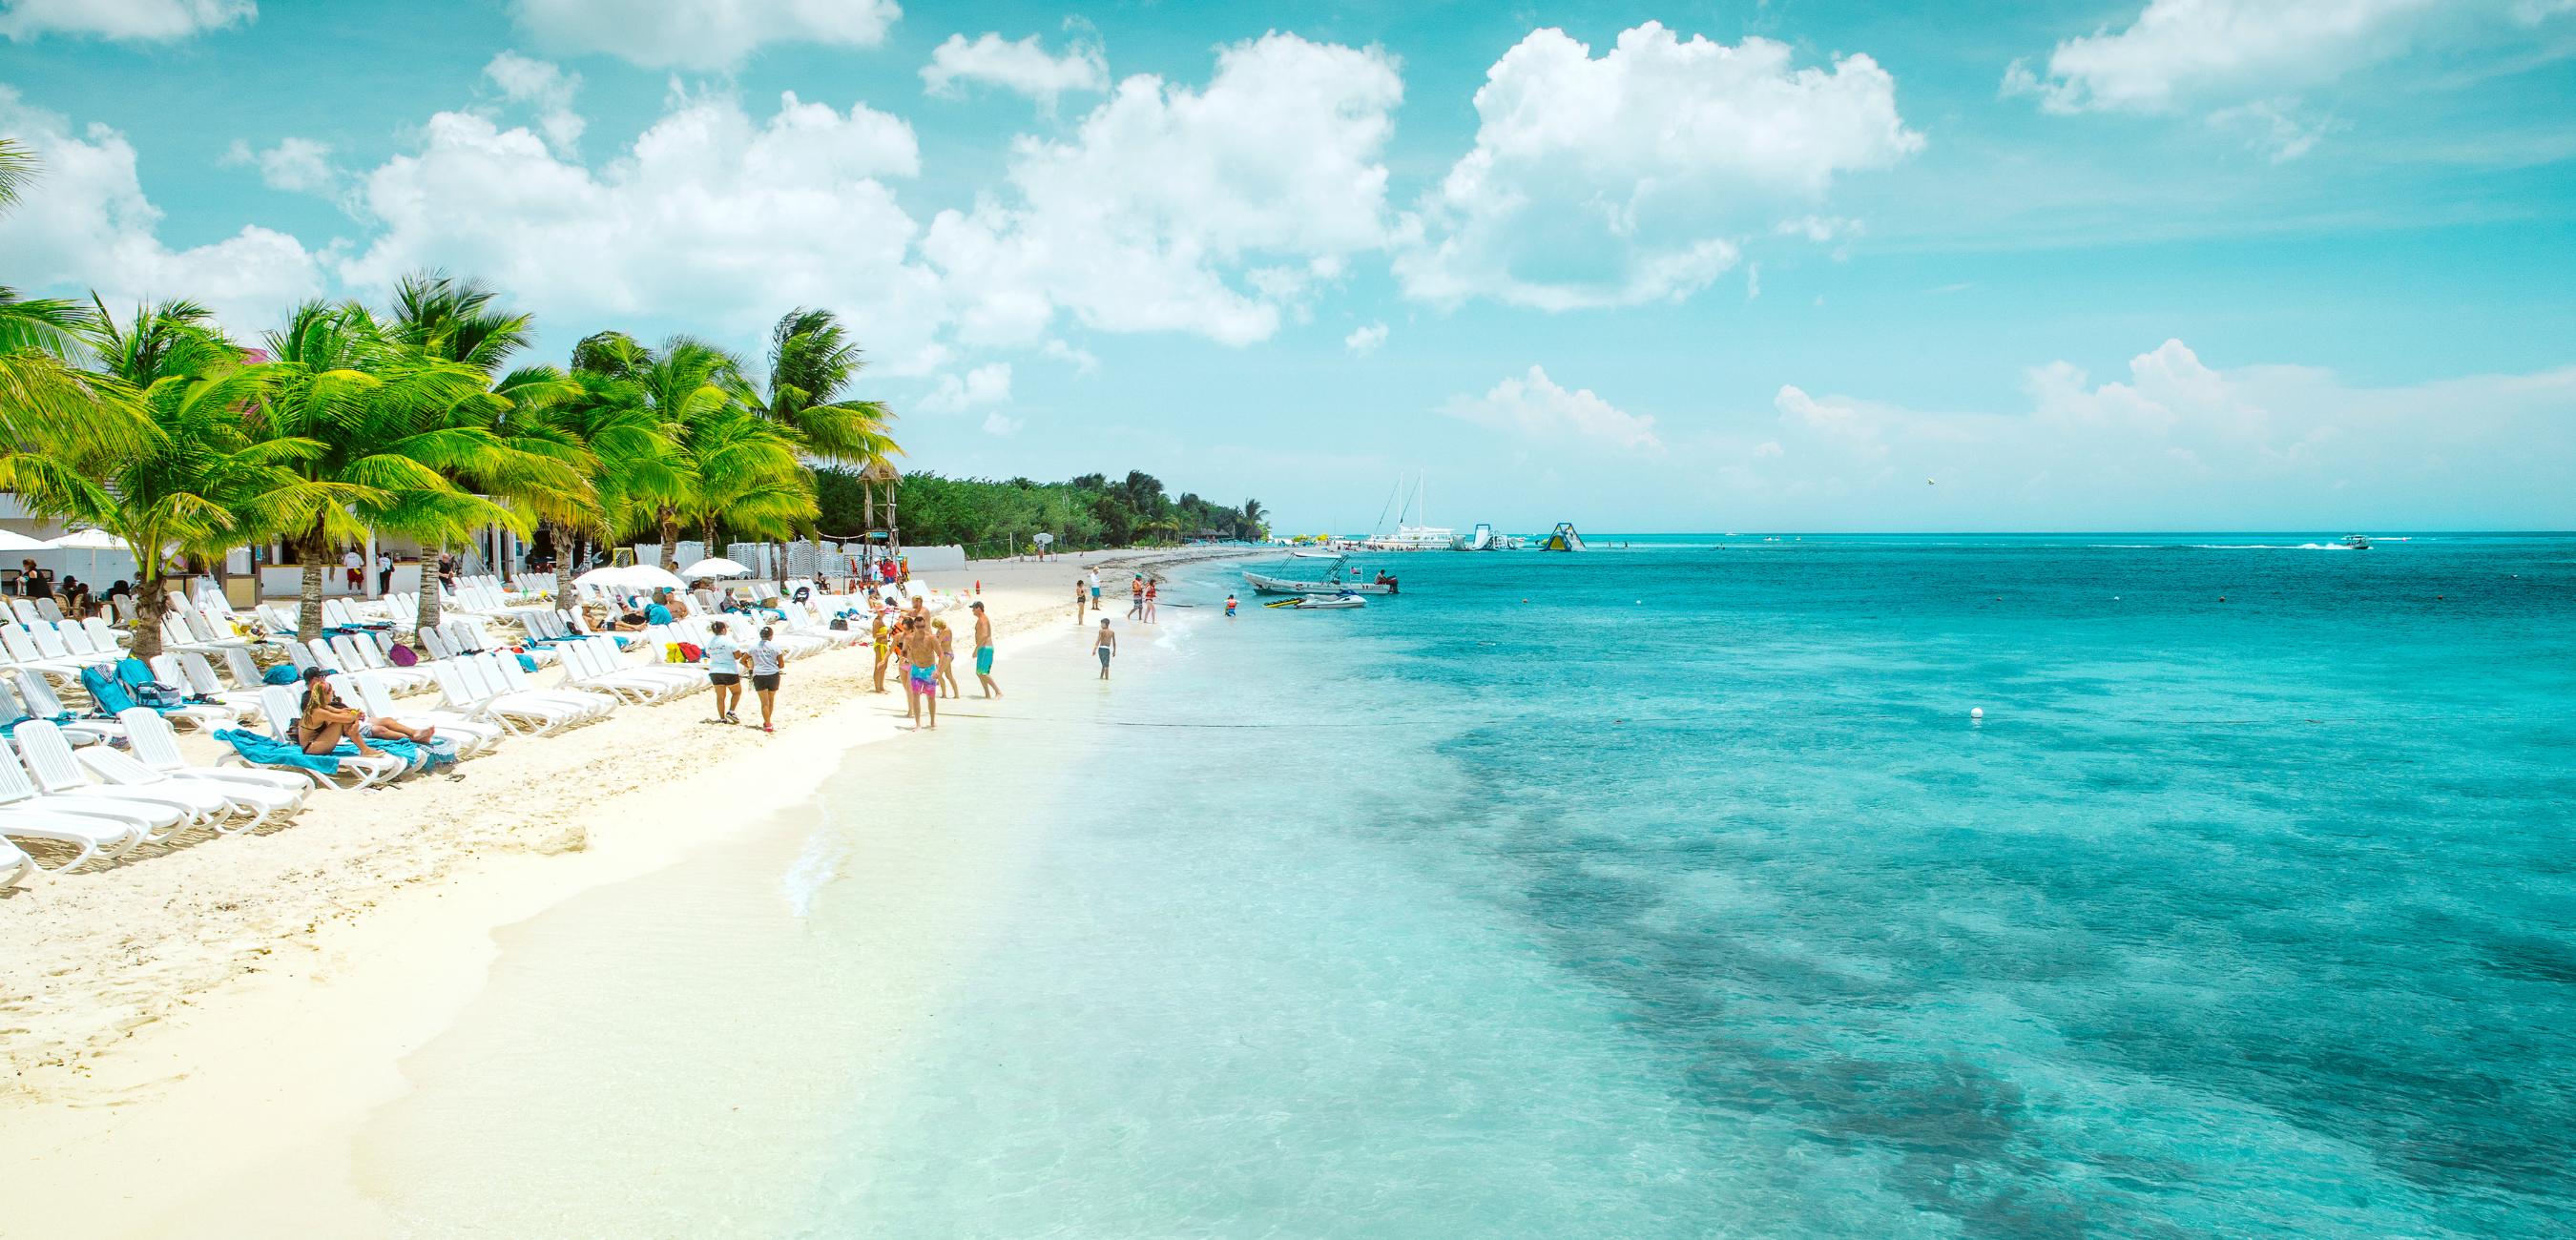 Insel Cozumel in Mexiko: Strände